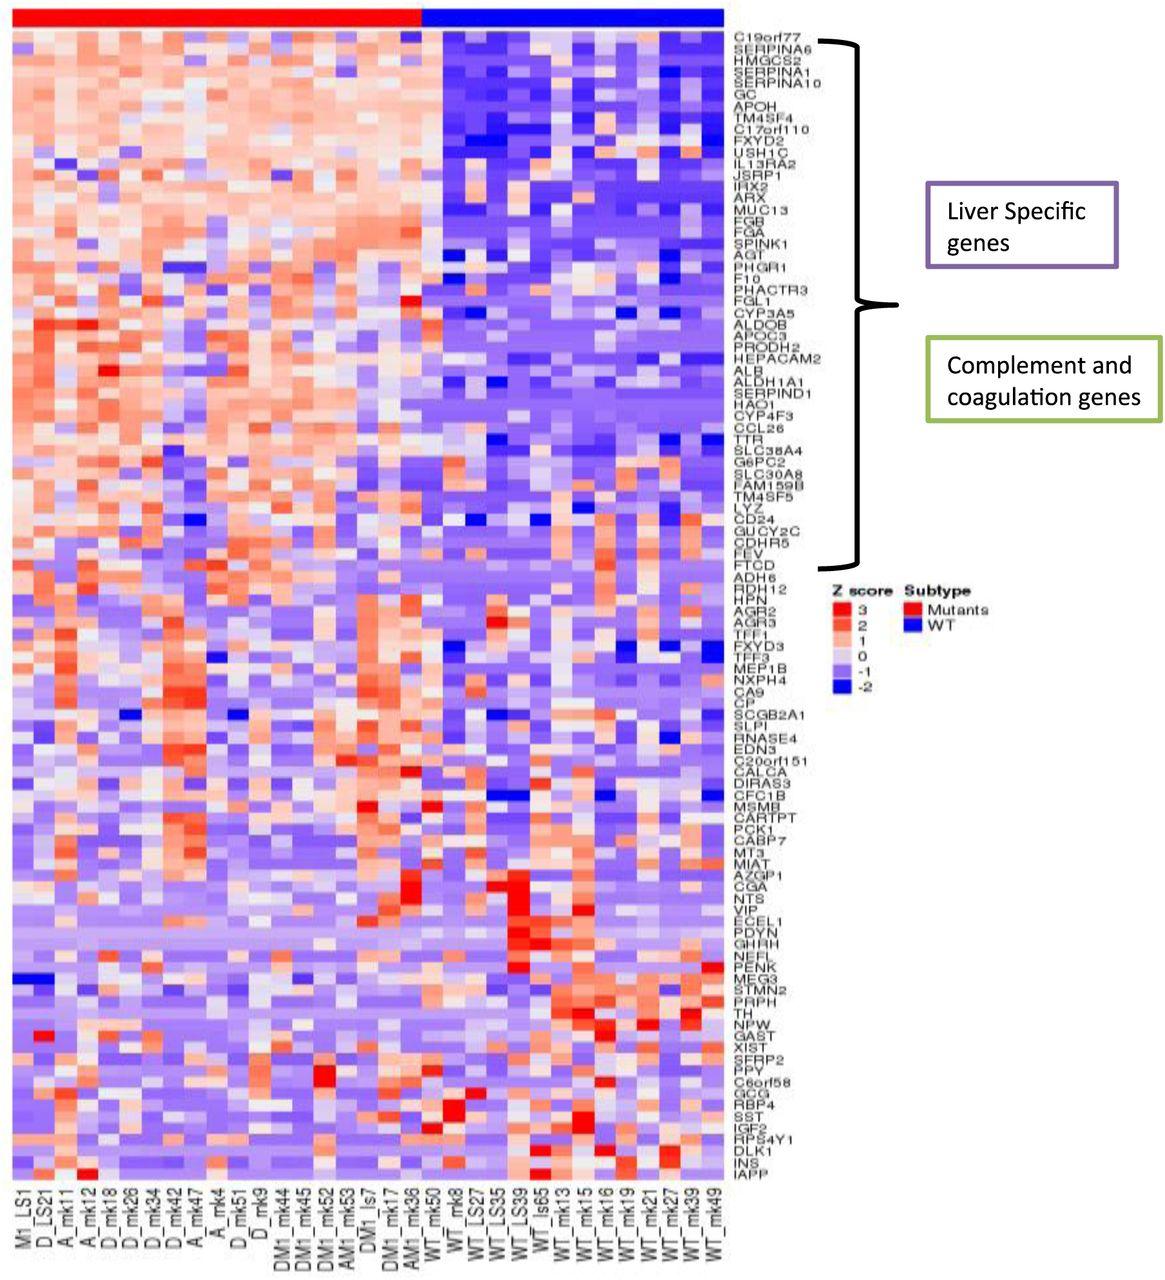 ATRX, DAXX or MEN1 mutant pancreatic neuroendocrine tumors are a